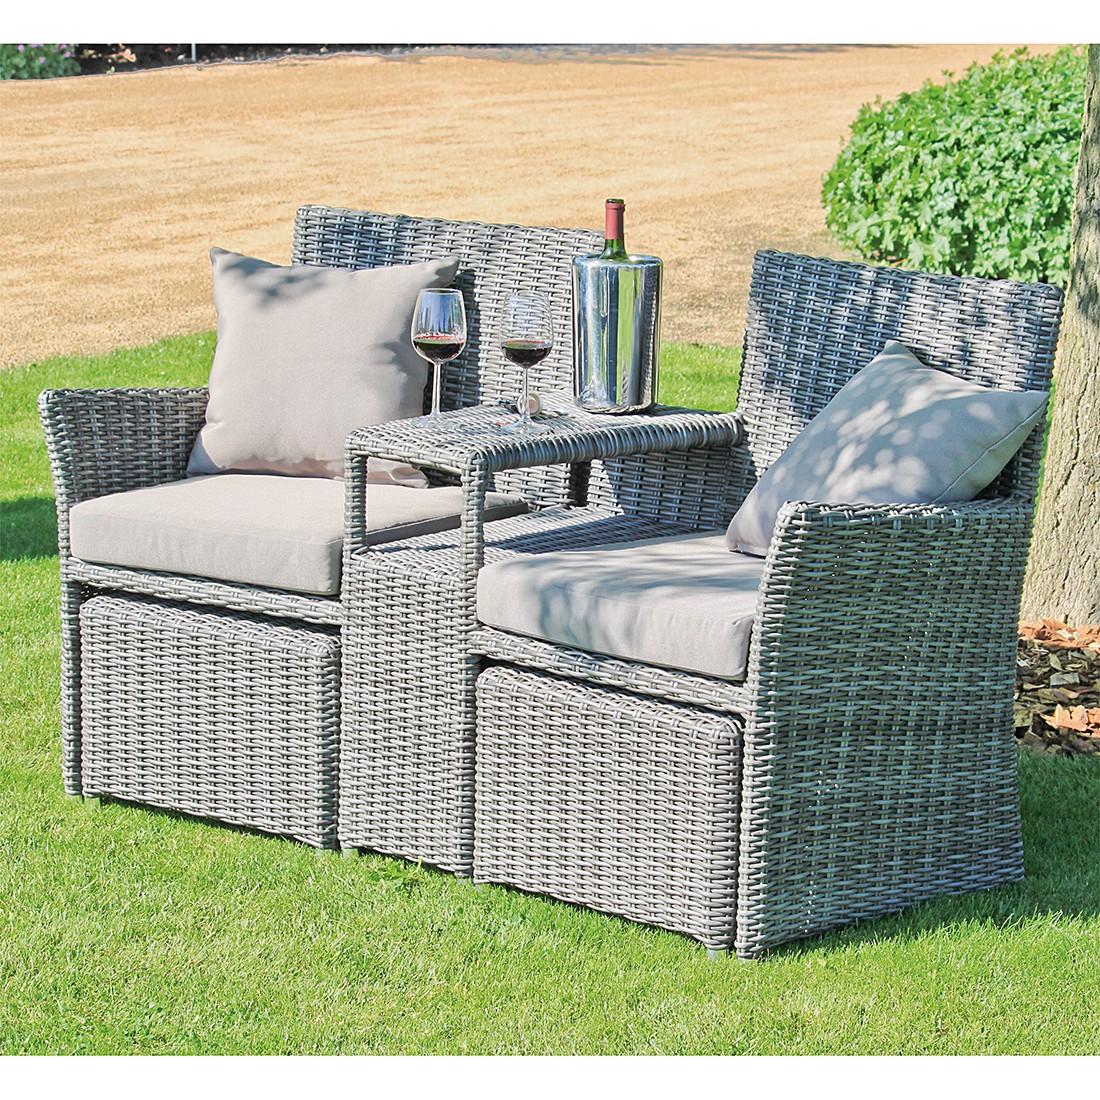 polyrattan stuhl grau rattan grau auflagen beige maestro rattan grau auflagen beige maestro. Black Bedroom Furniture Sets. Home Design Ideas